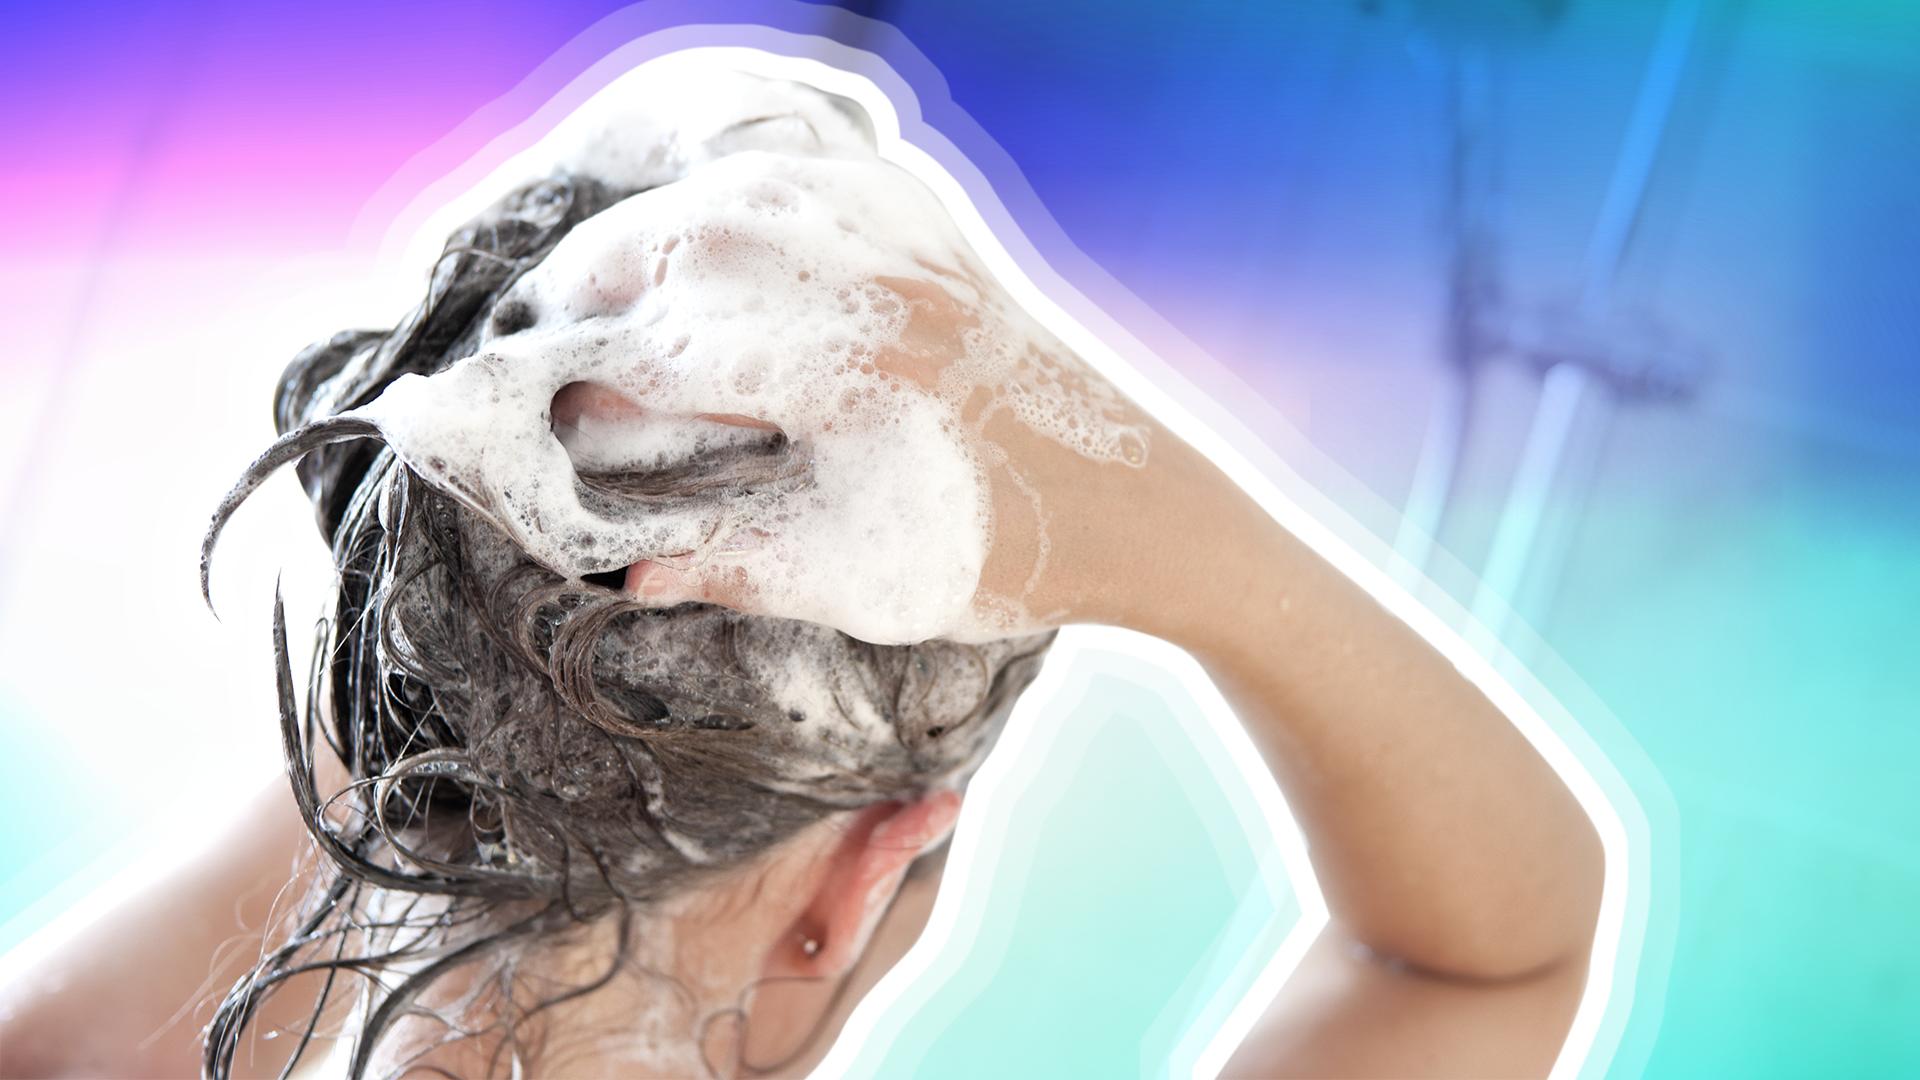 How Often Should I Wash My Hair